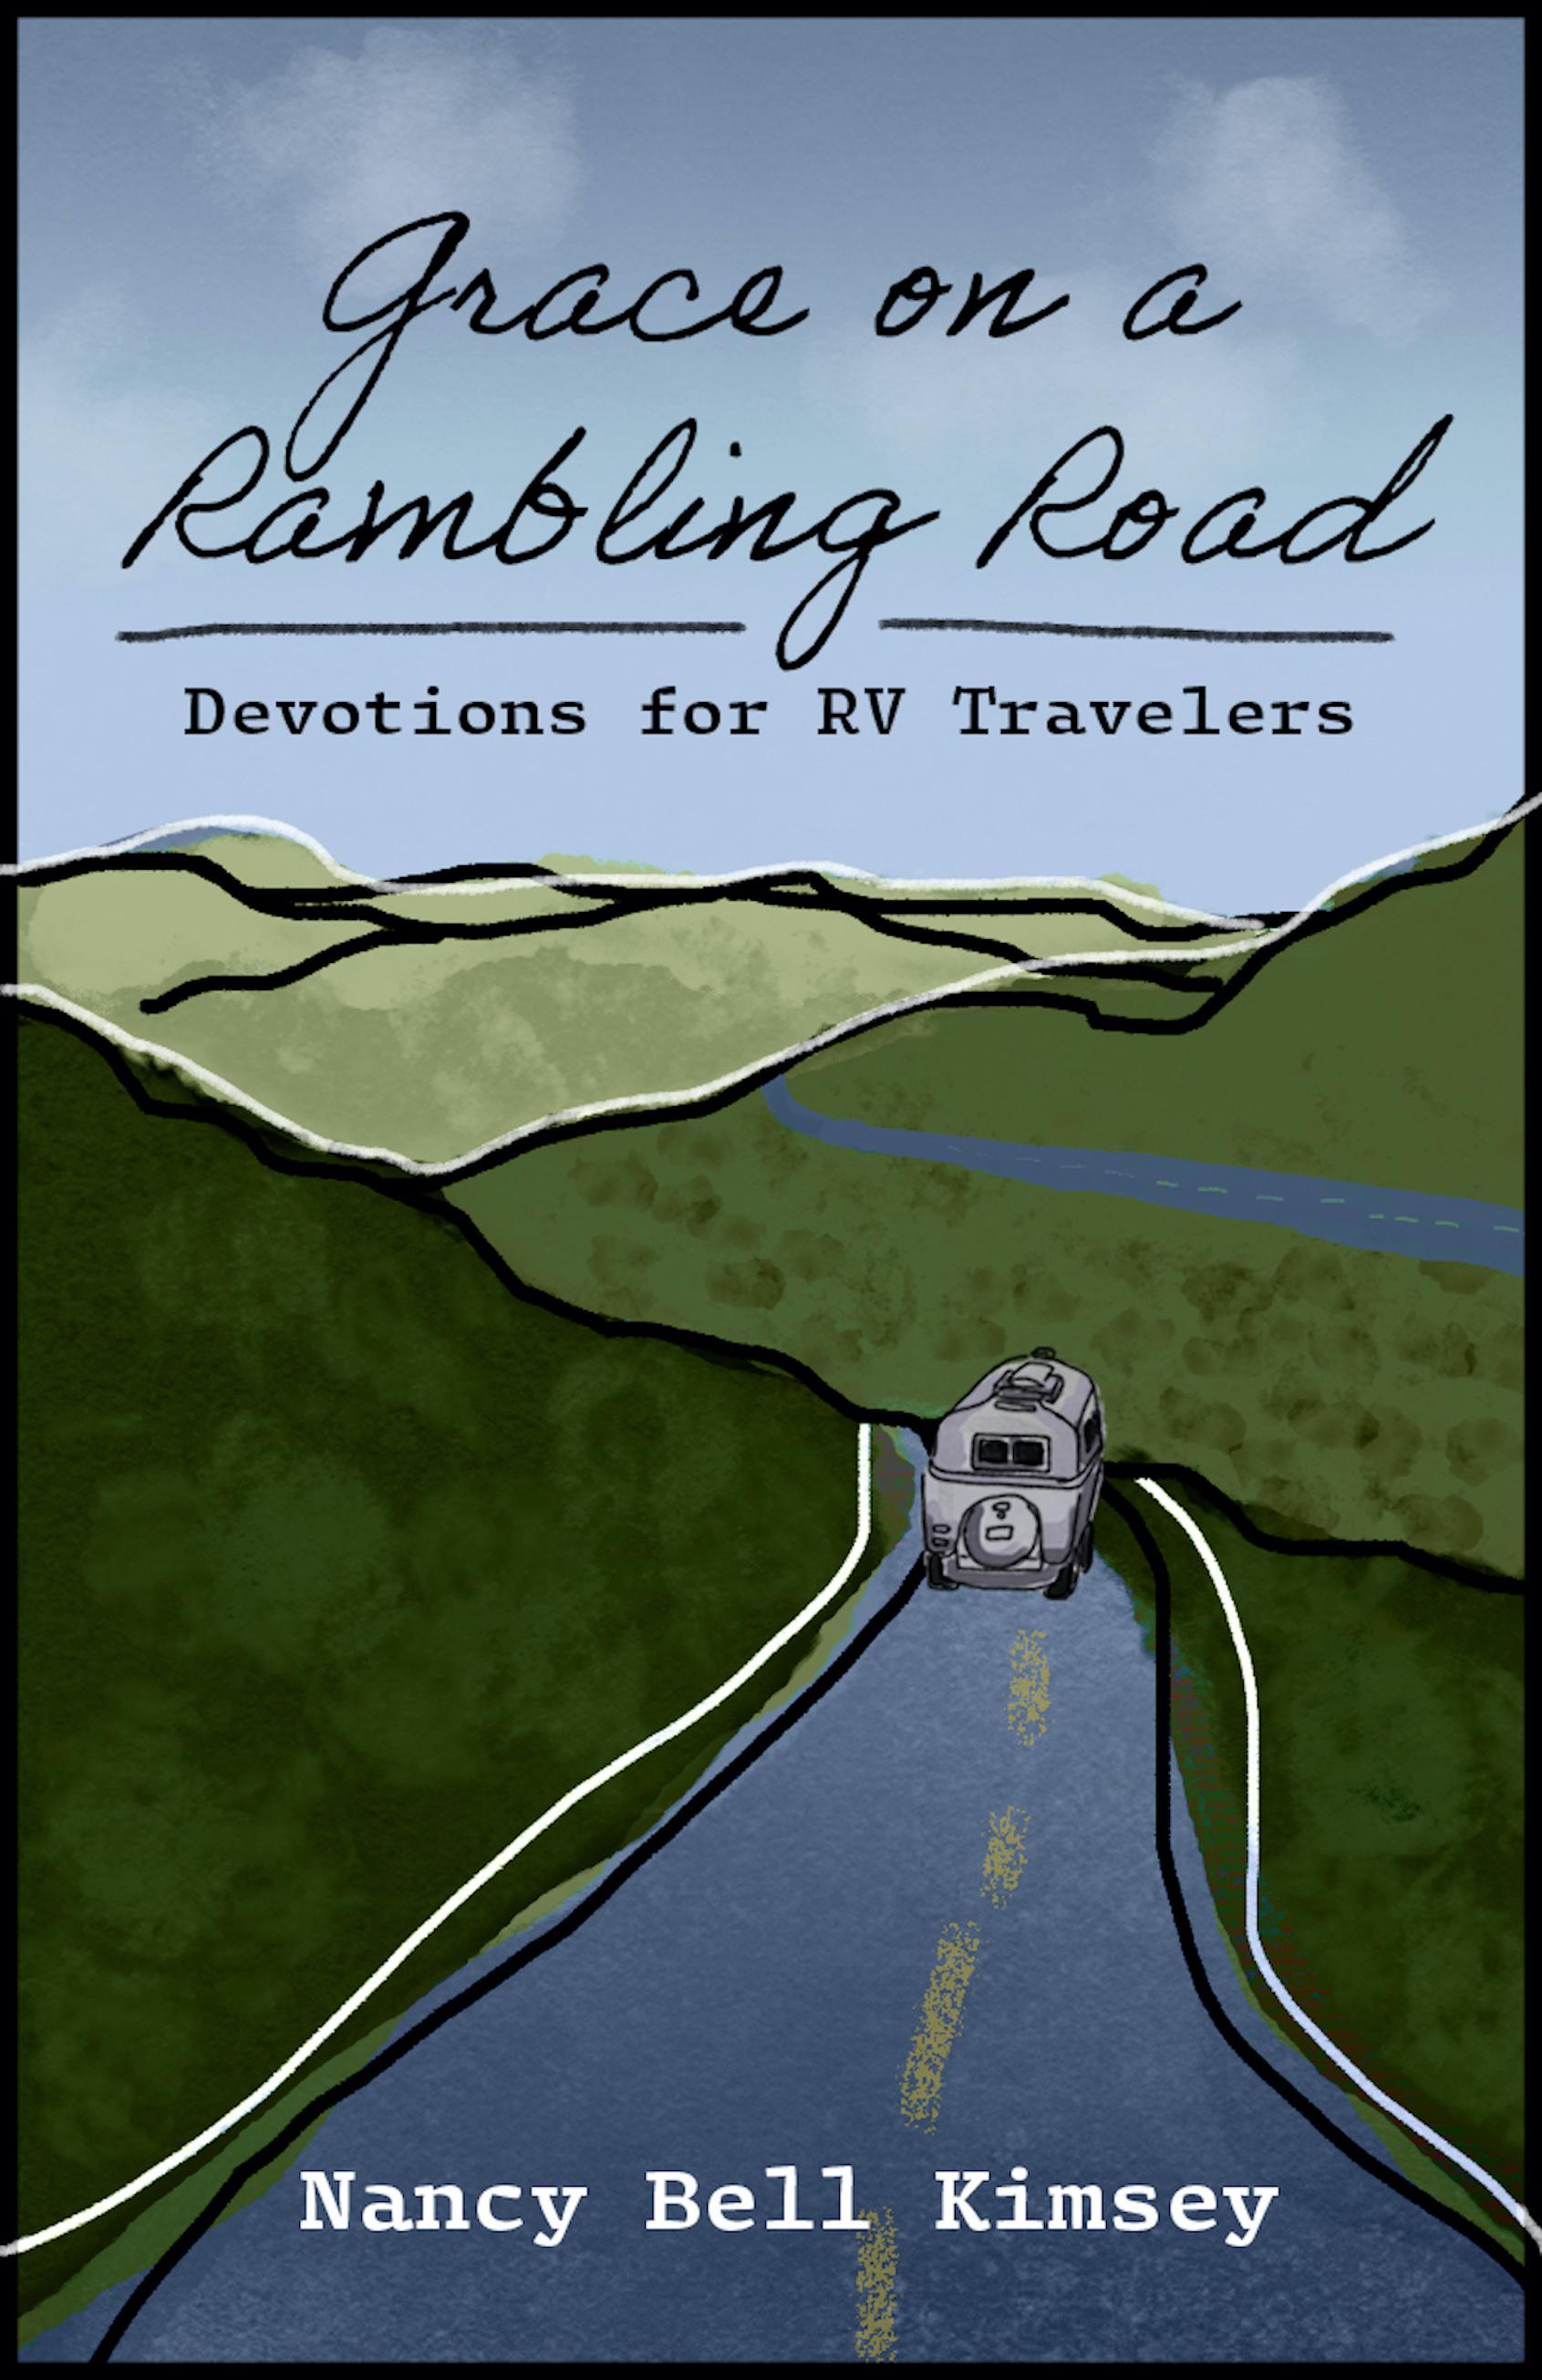 Rambling Road Cover4 (2) copy for resizing.jpg